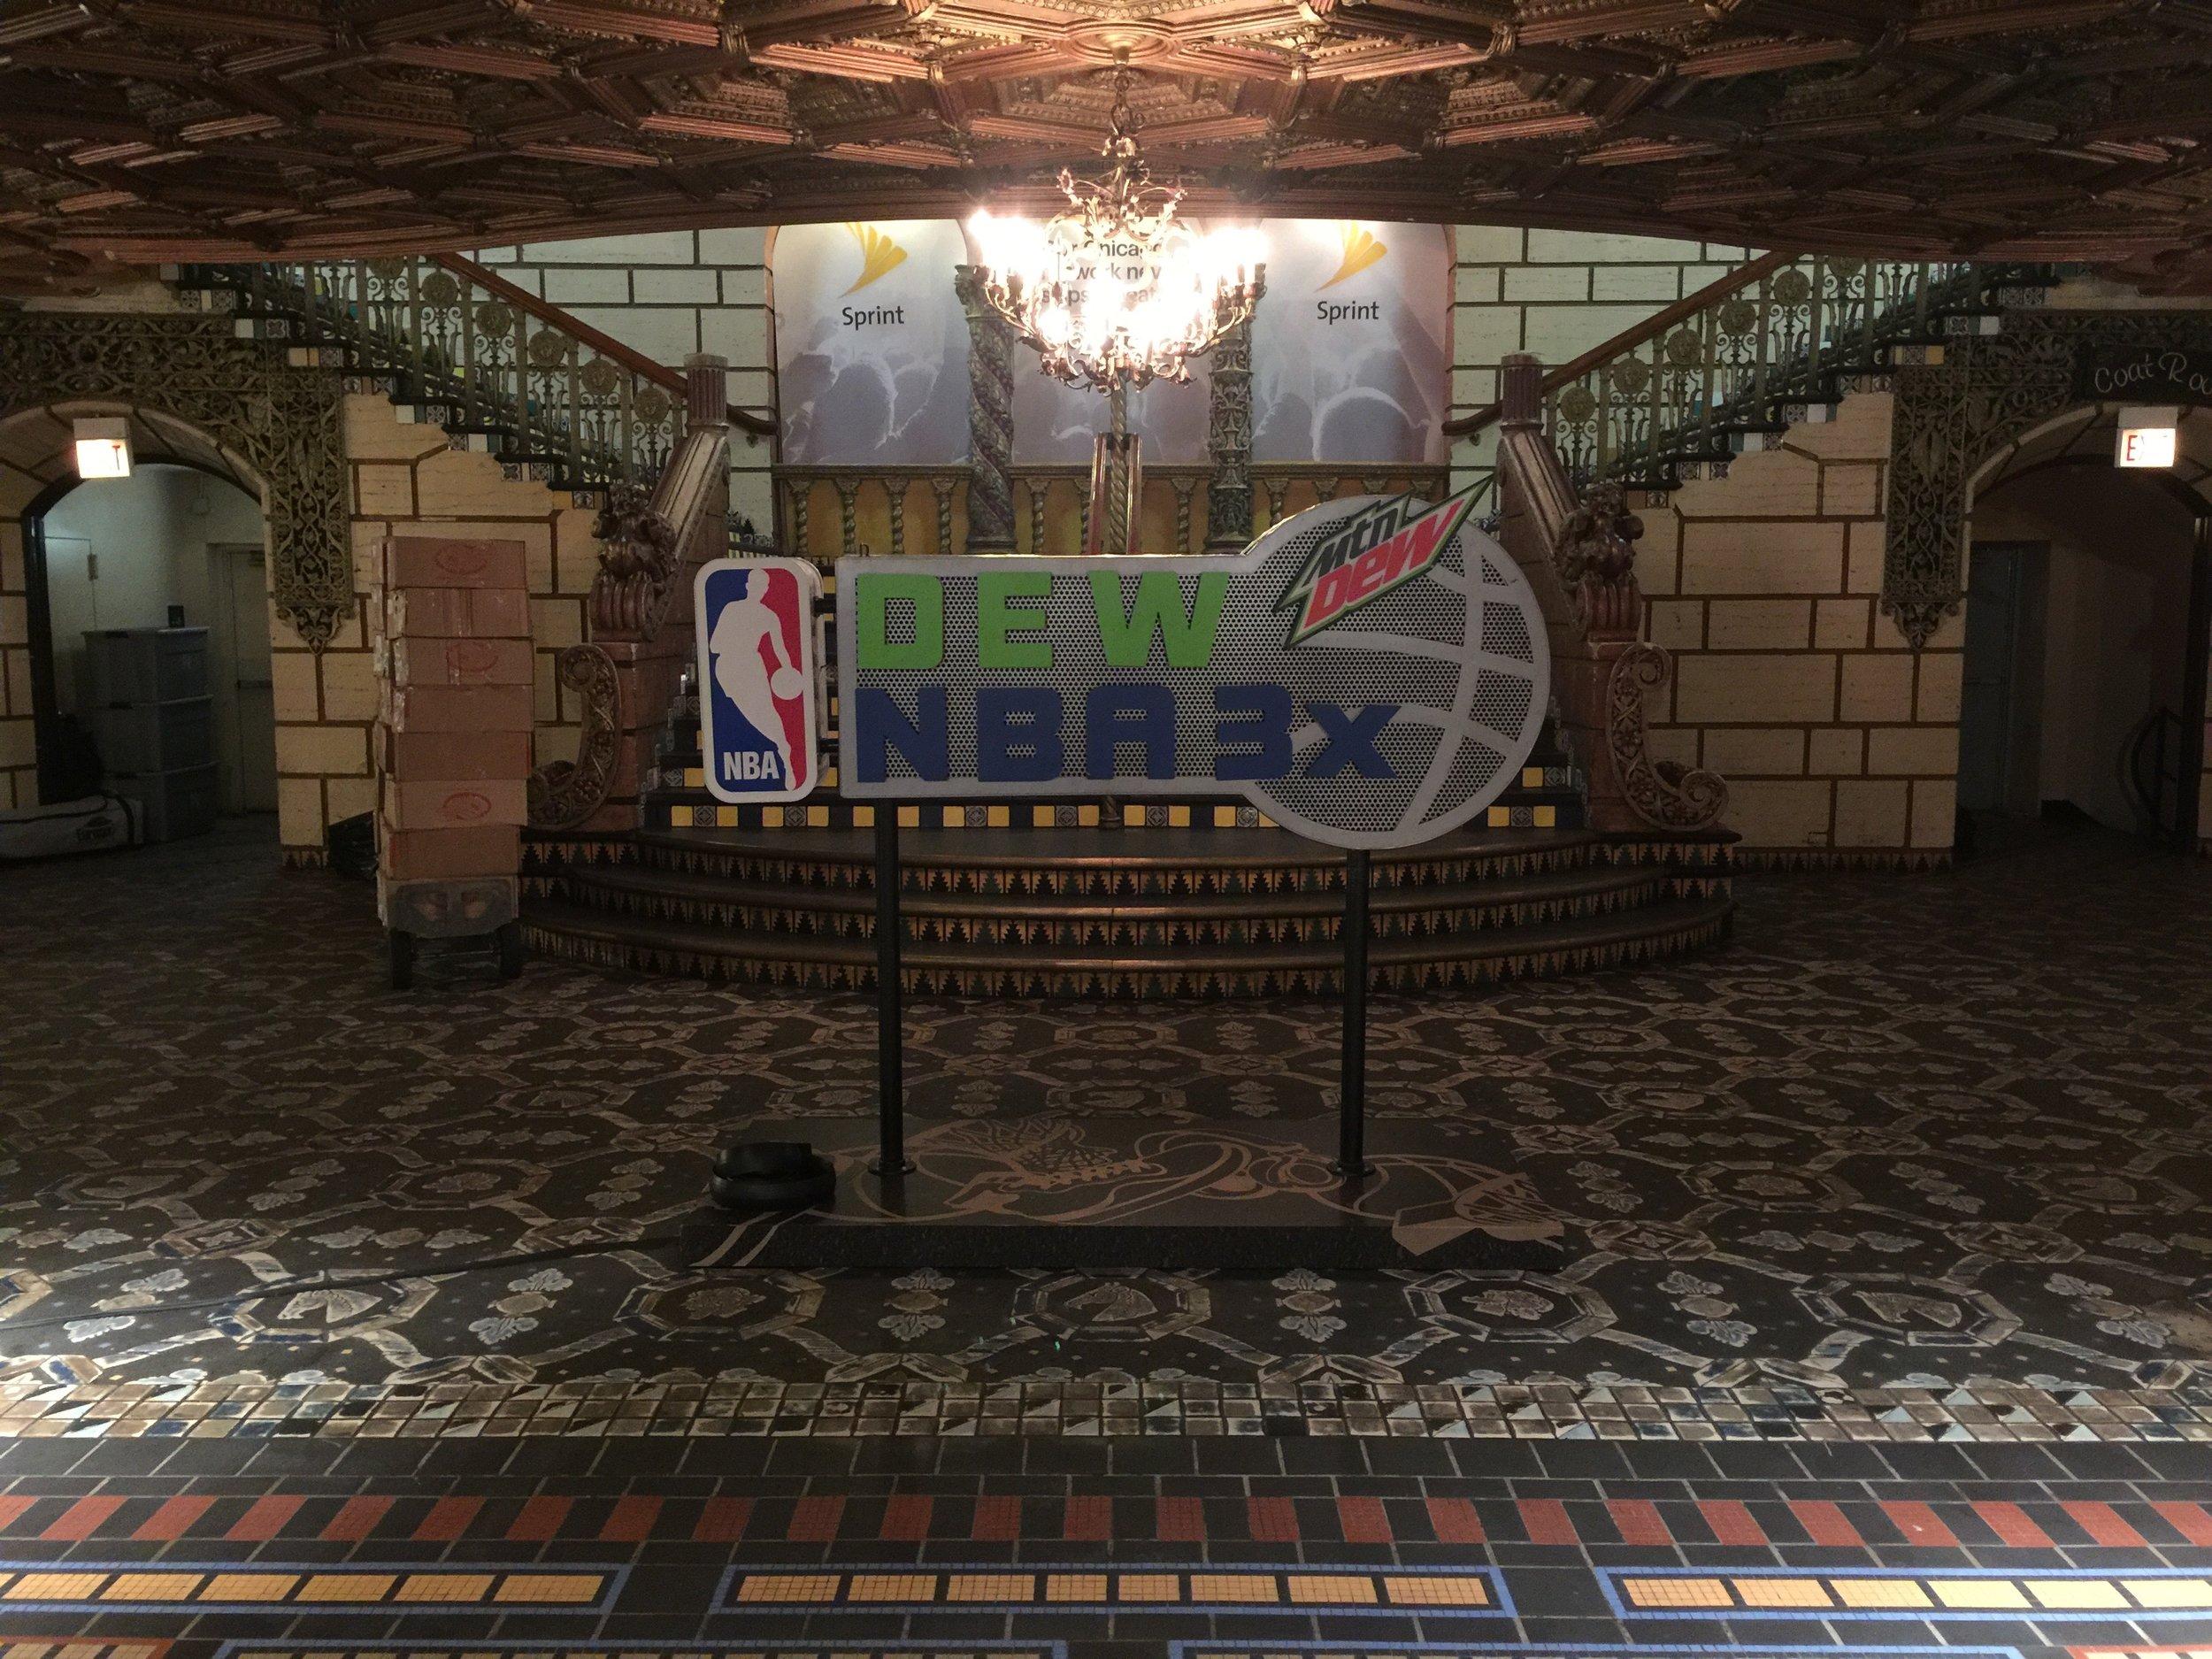 Dew NBA 3X_2016)Team Photo 2.JPG